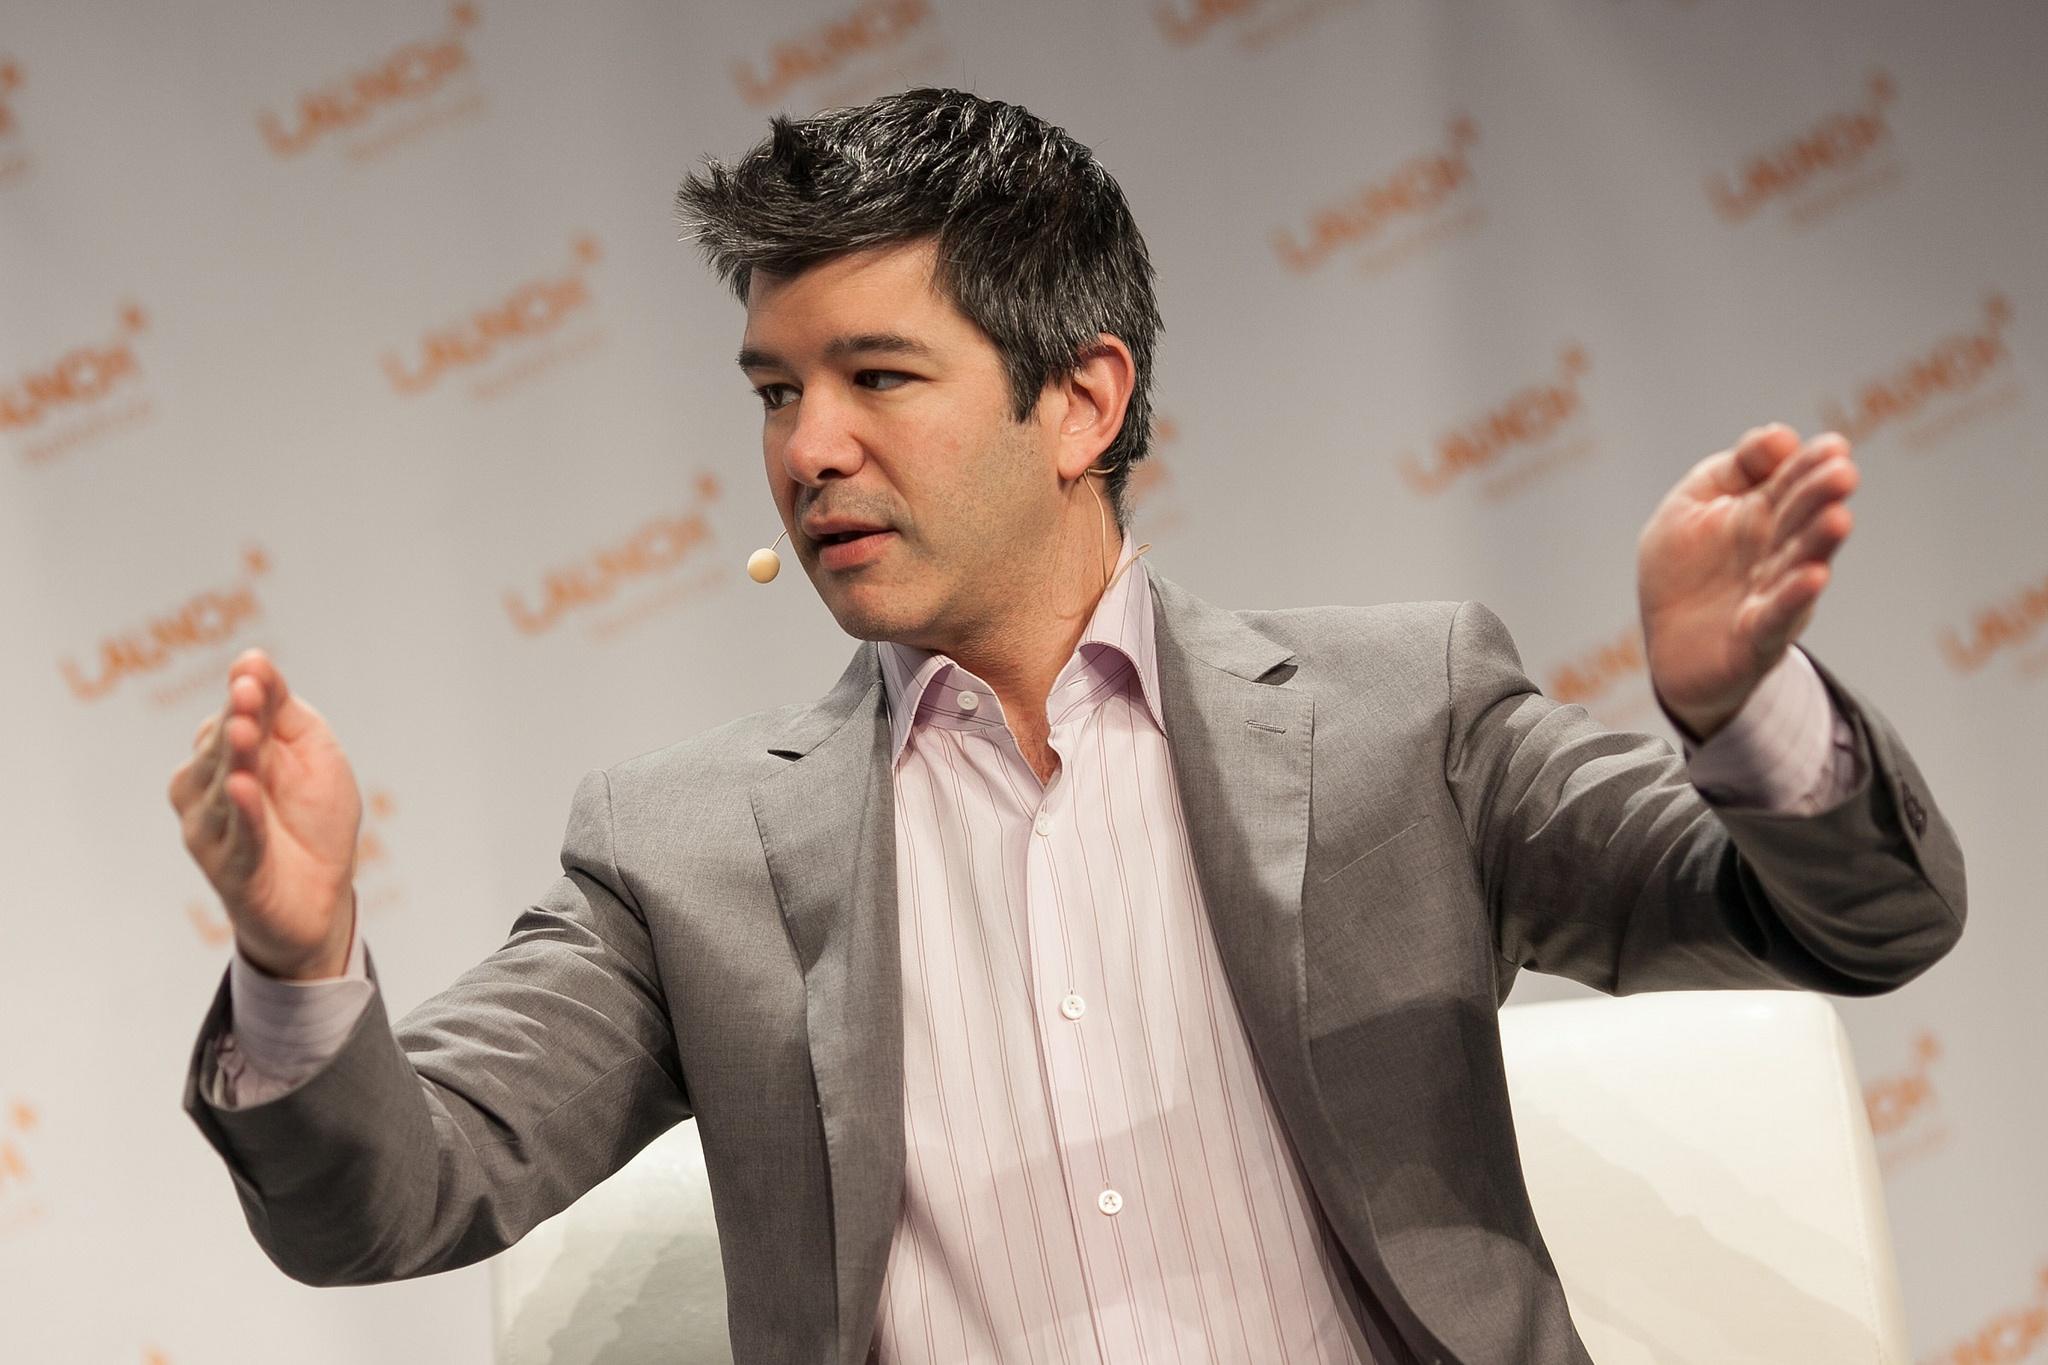 Uber founder Travis Kalanick